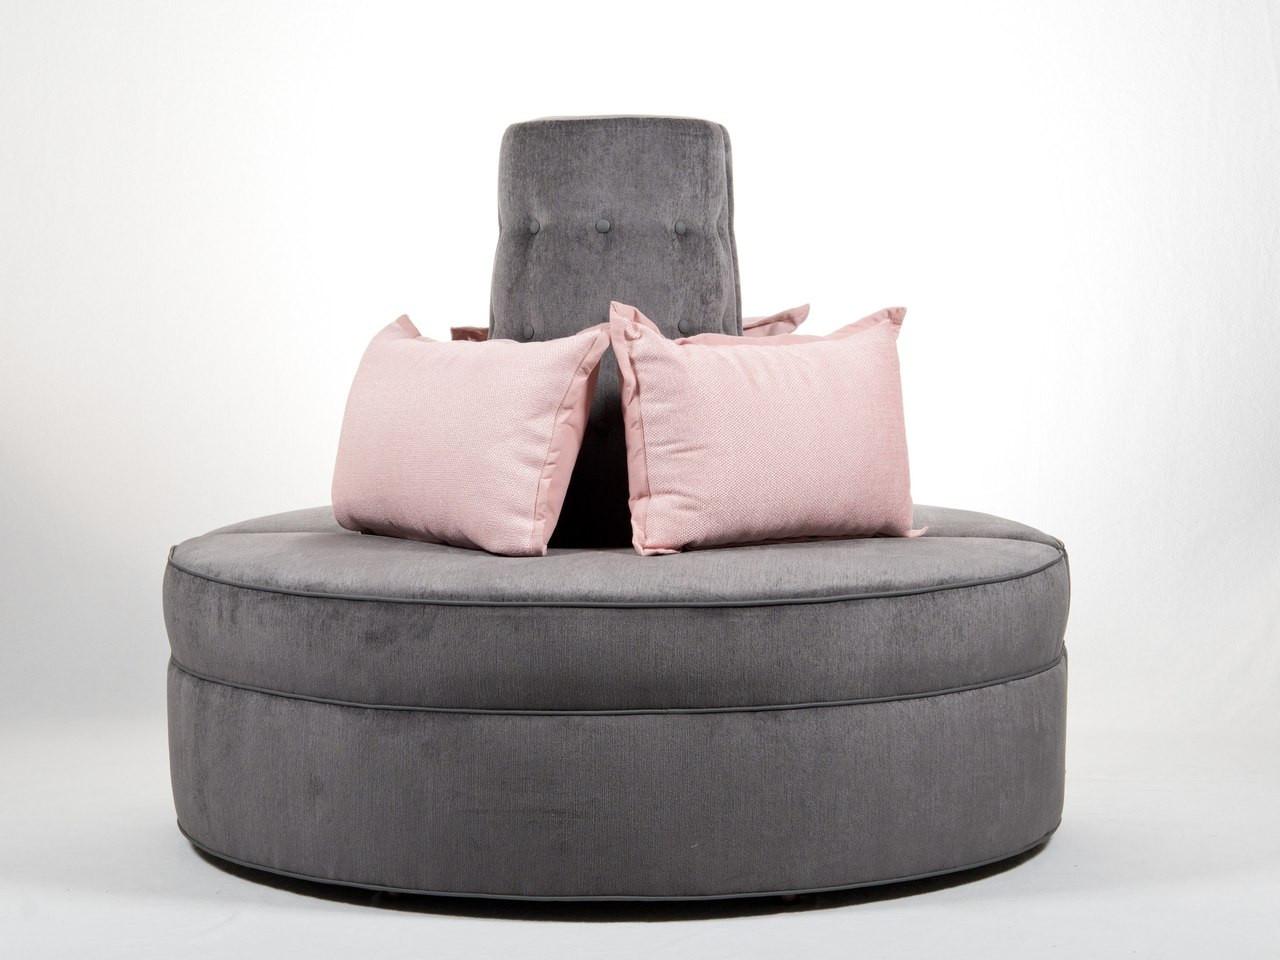 Attractive Round Banquette Settee Lobby Sofa In Gray Chenille Fabric